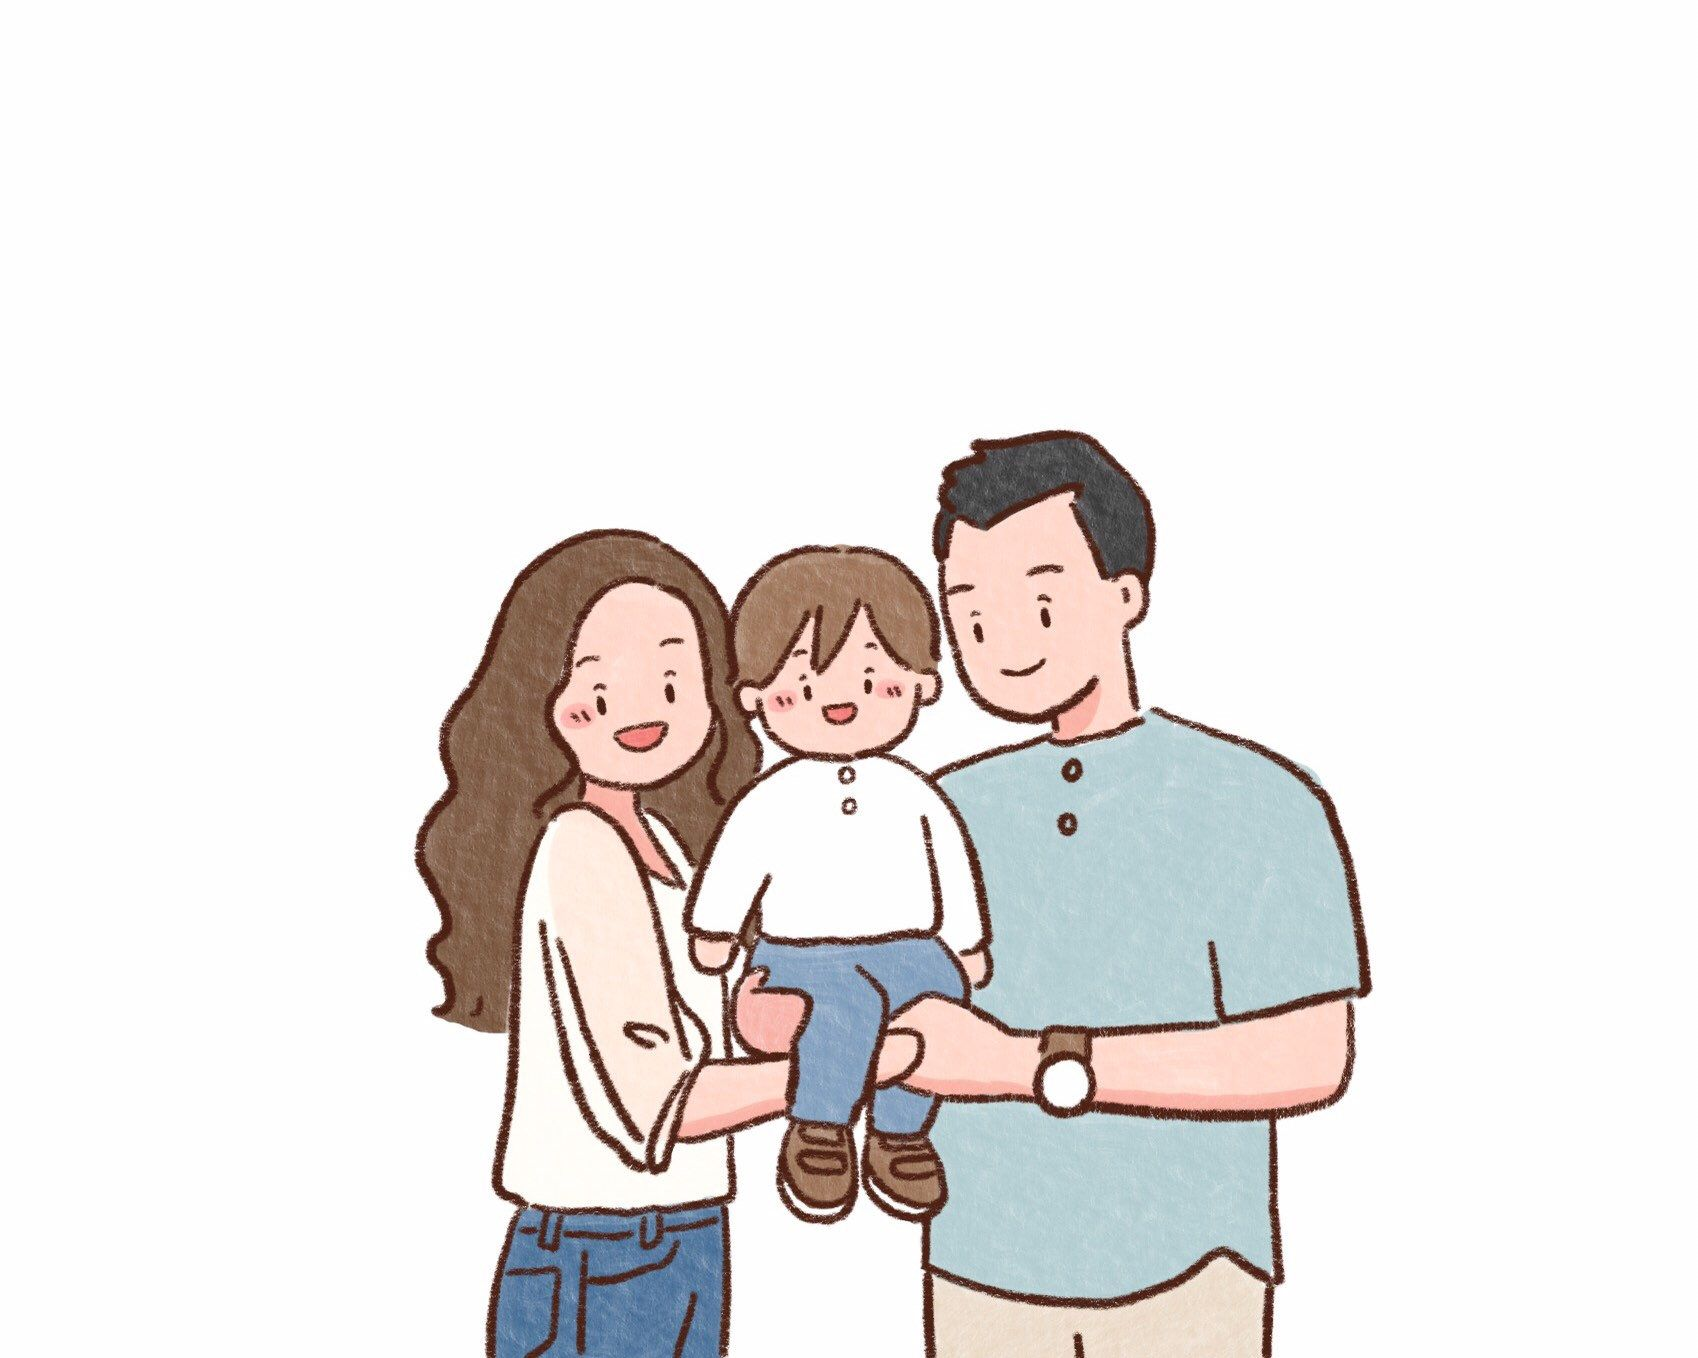 Waist Up Family Portrait Family Drawing Anniversary Gifts Etsy Family Drawing Family Illustration Family Cartoon